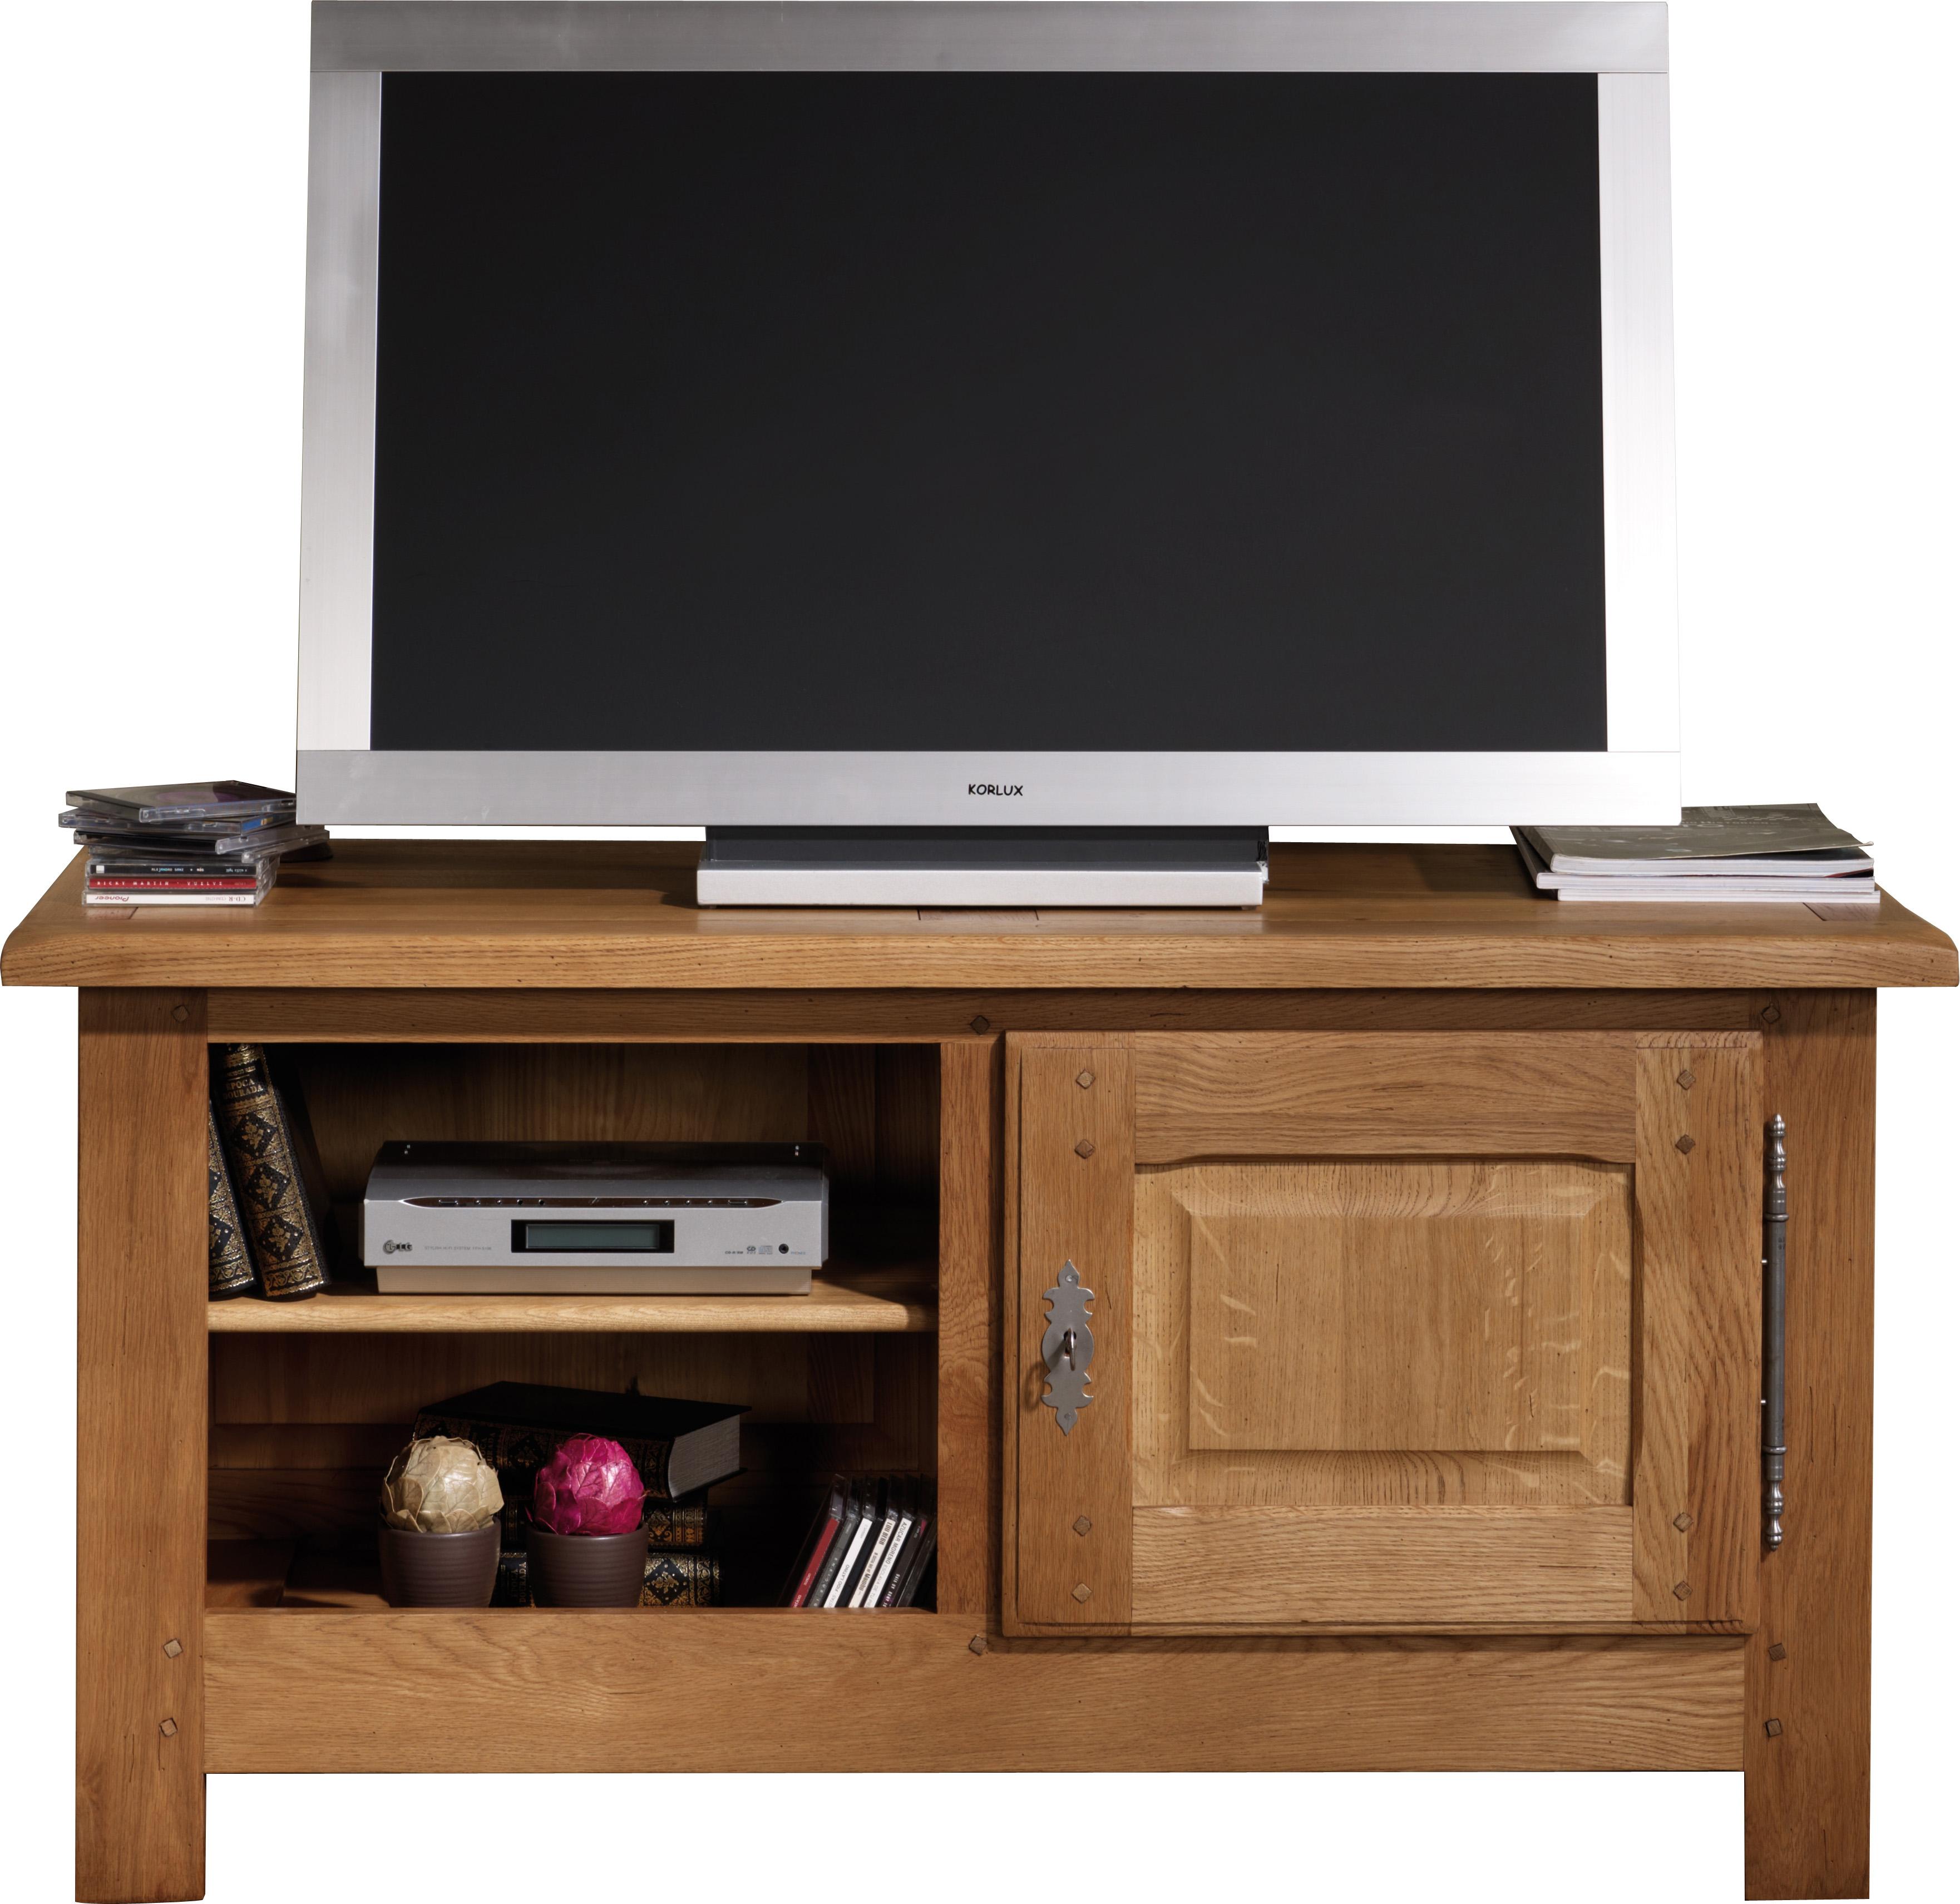 meuble hifi porte meuble bas hifi chene 4 portes 2 armarbois mobilier meuble banc tv ch ne 1. Black Bedroom Furniture Sets. Home Design Ideas